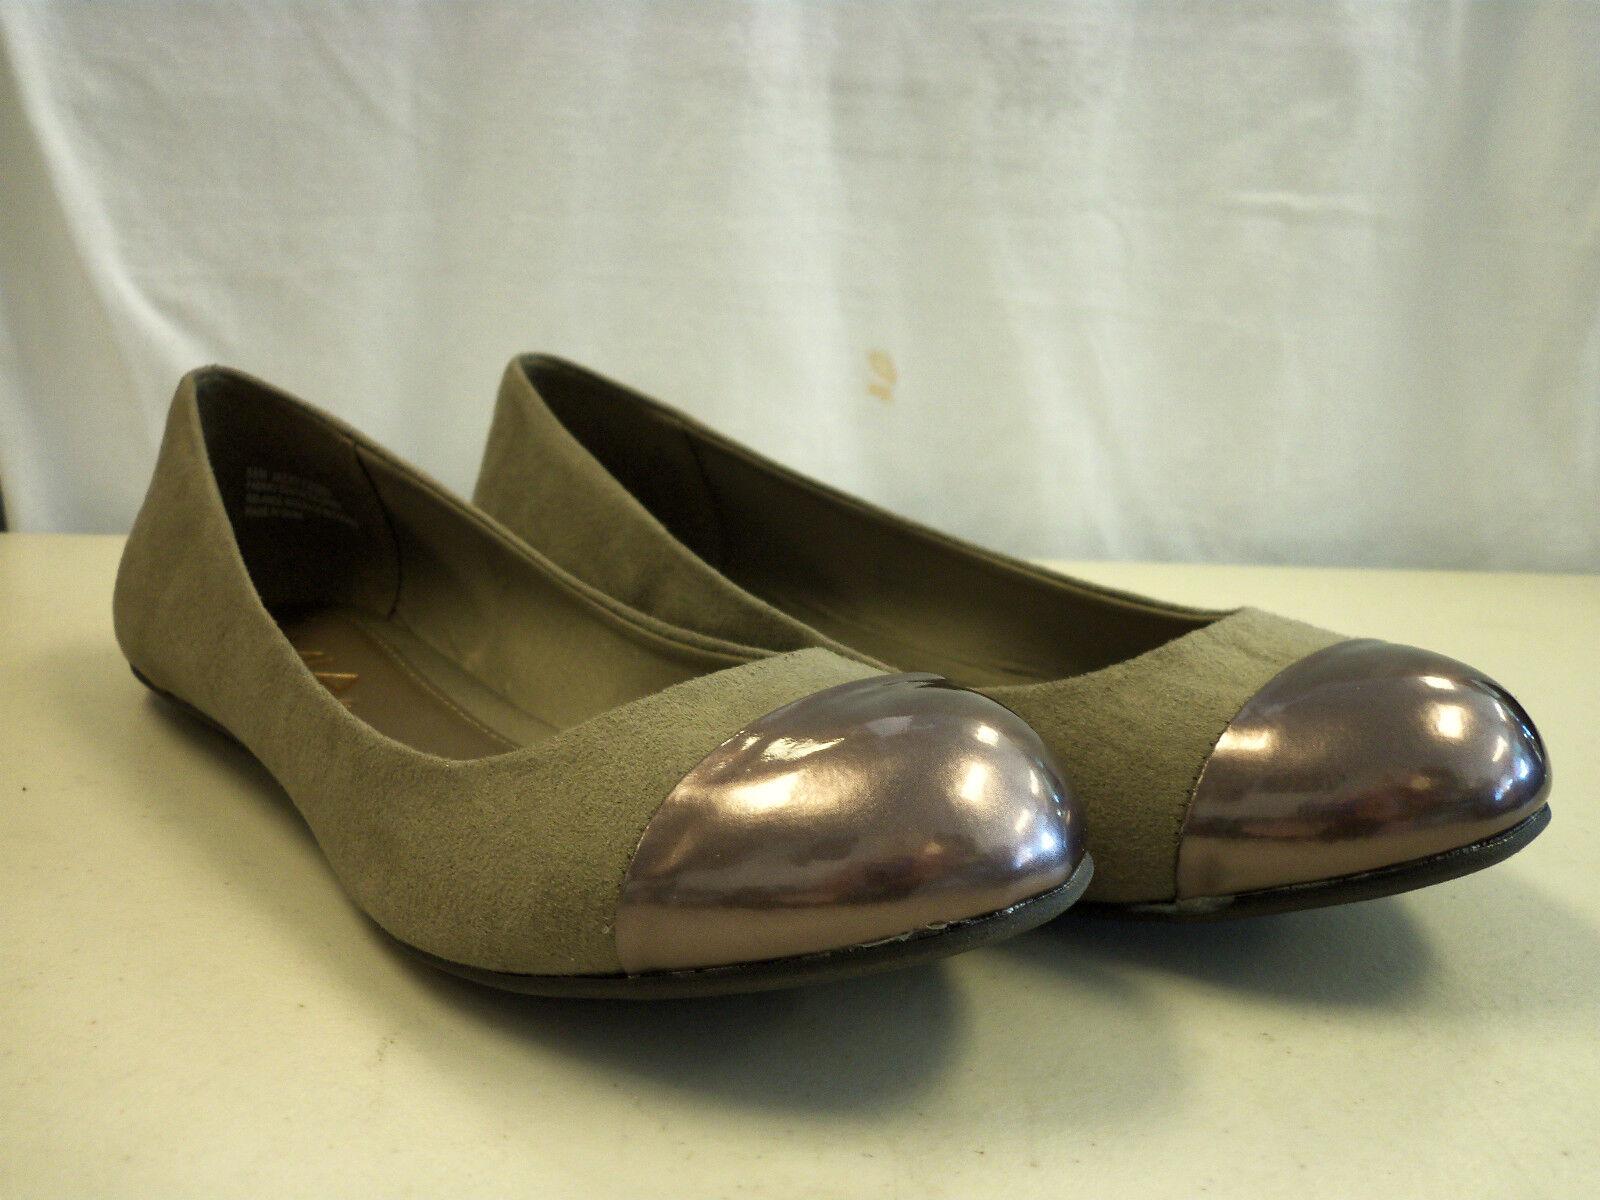 MIA New Damenschuhe Jacky Gray Flats 6.5 M Schuhes NWOB